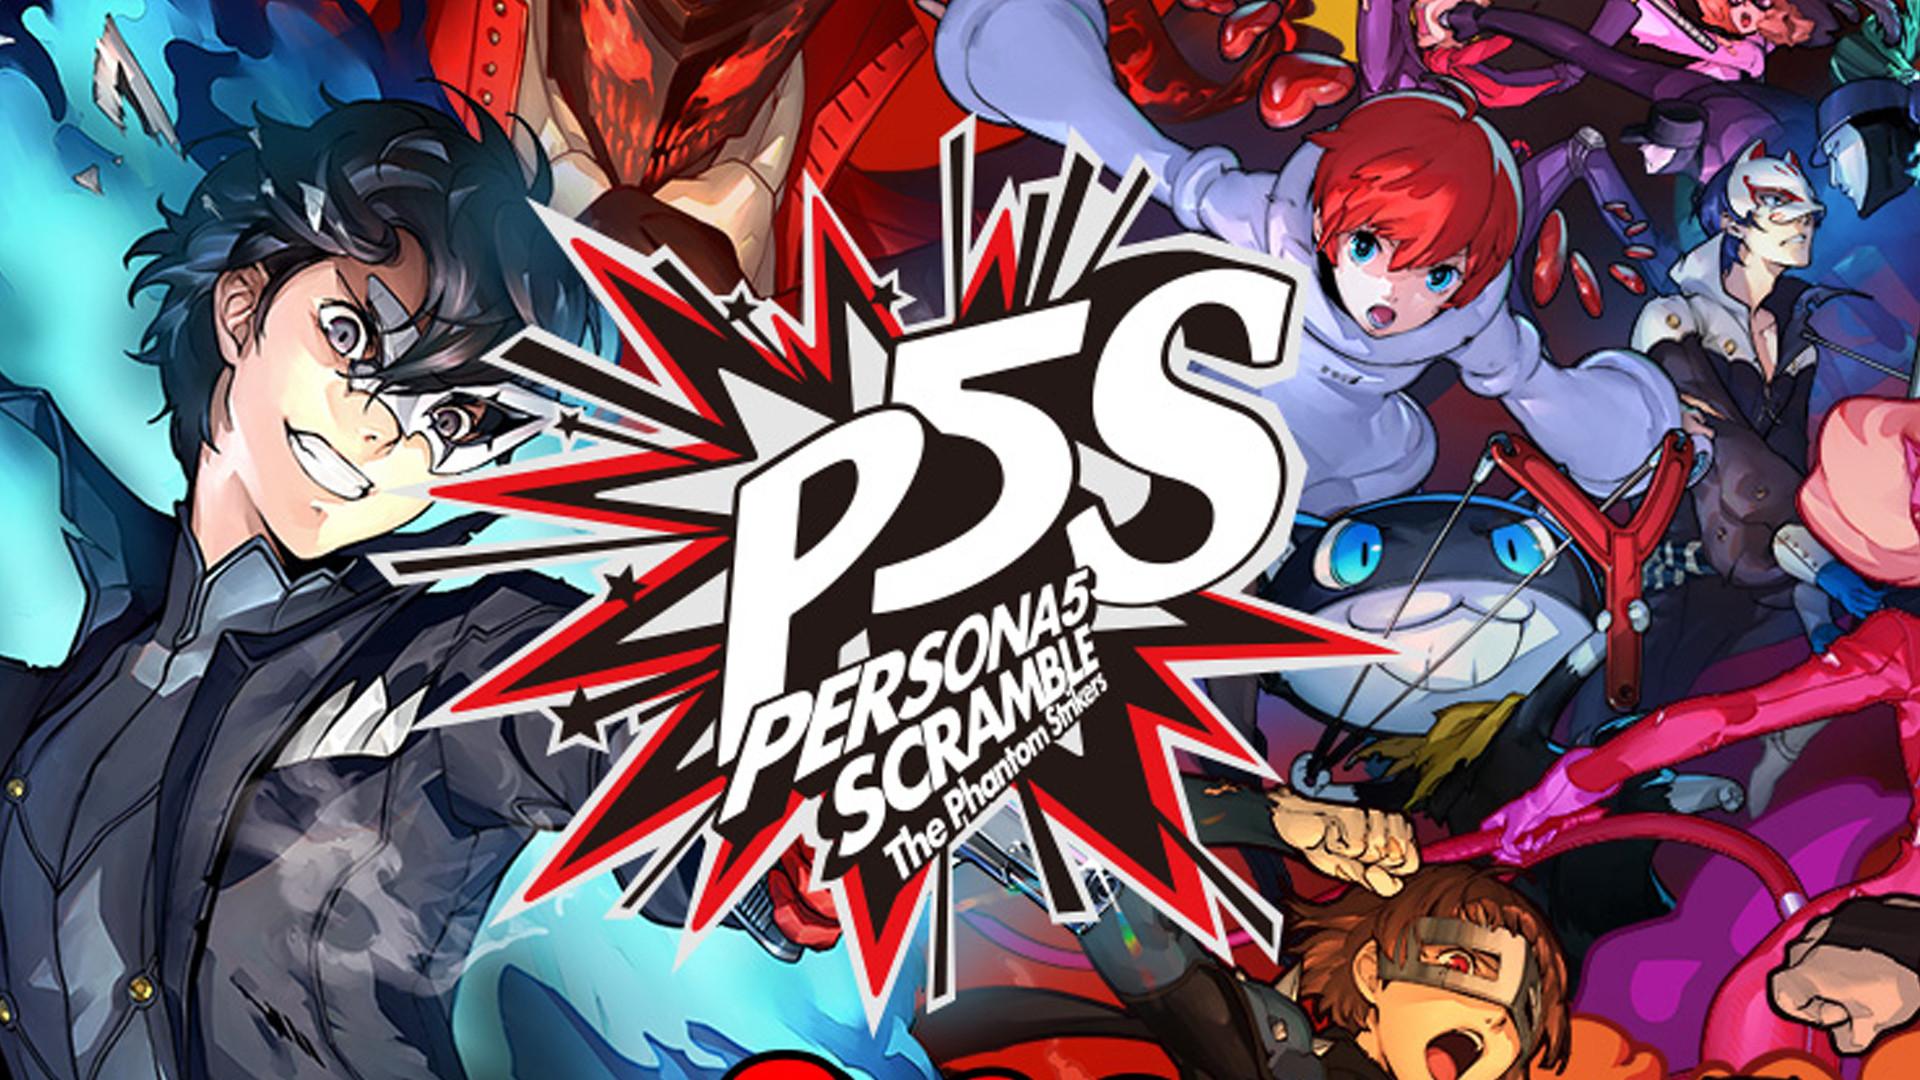 Igra Persona 5 Scramble: The Phantom Strikers prejme novo uvodno pesem